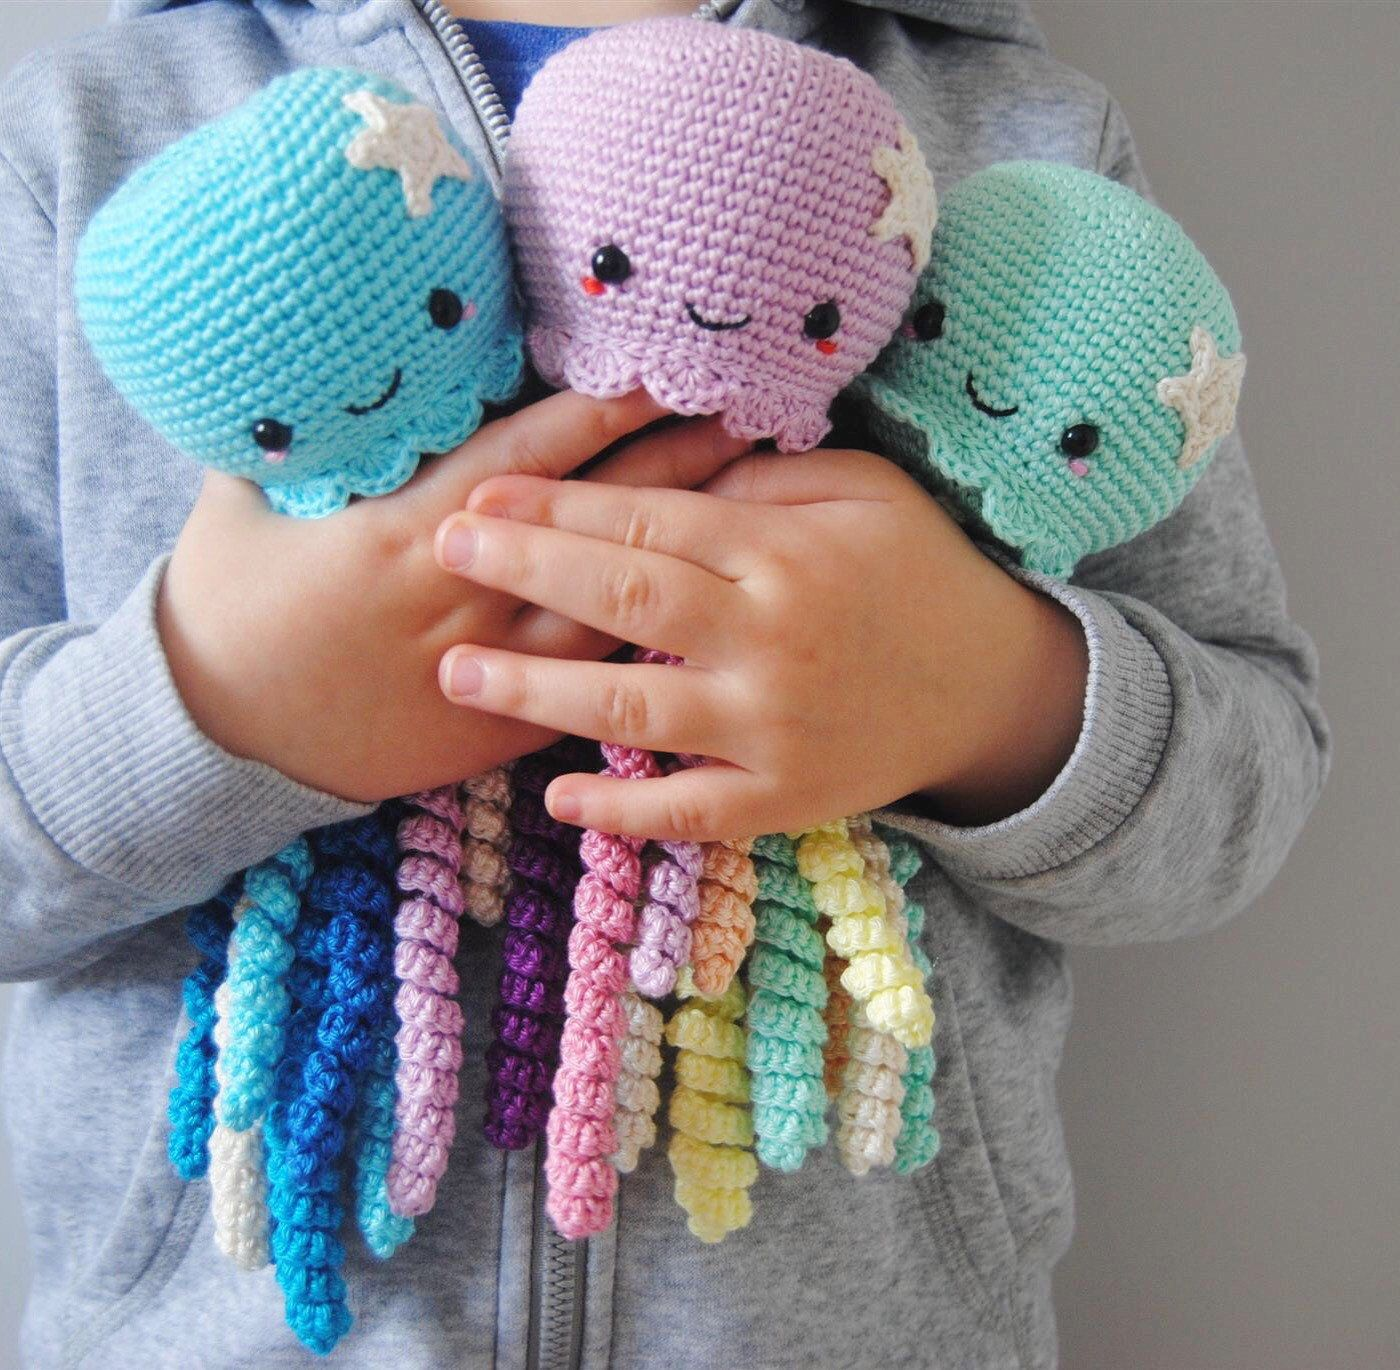 Crochet Octopus Pattern/ Amigurumi Octopus / Amigurumi Pattern/ Crochet Pattern #crochetoctopus